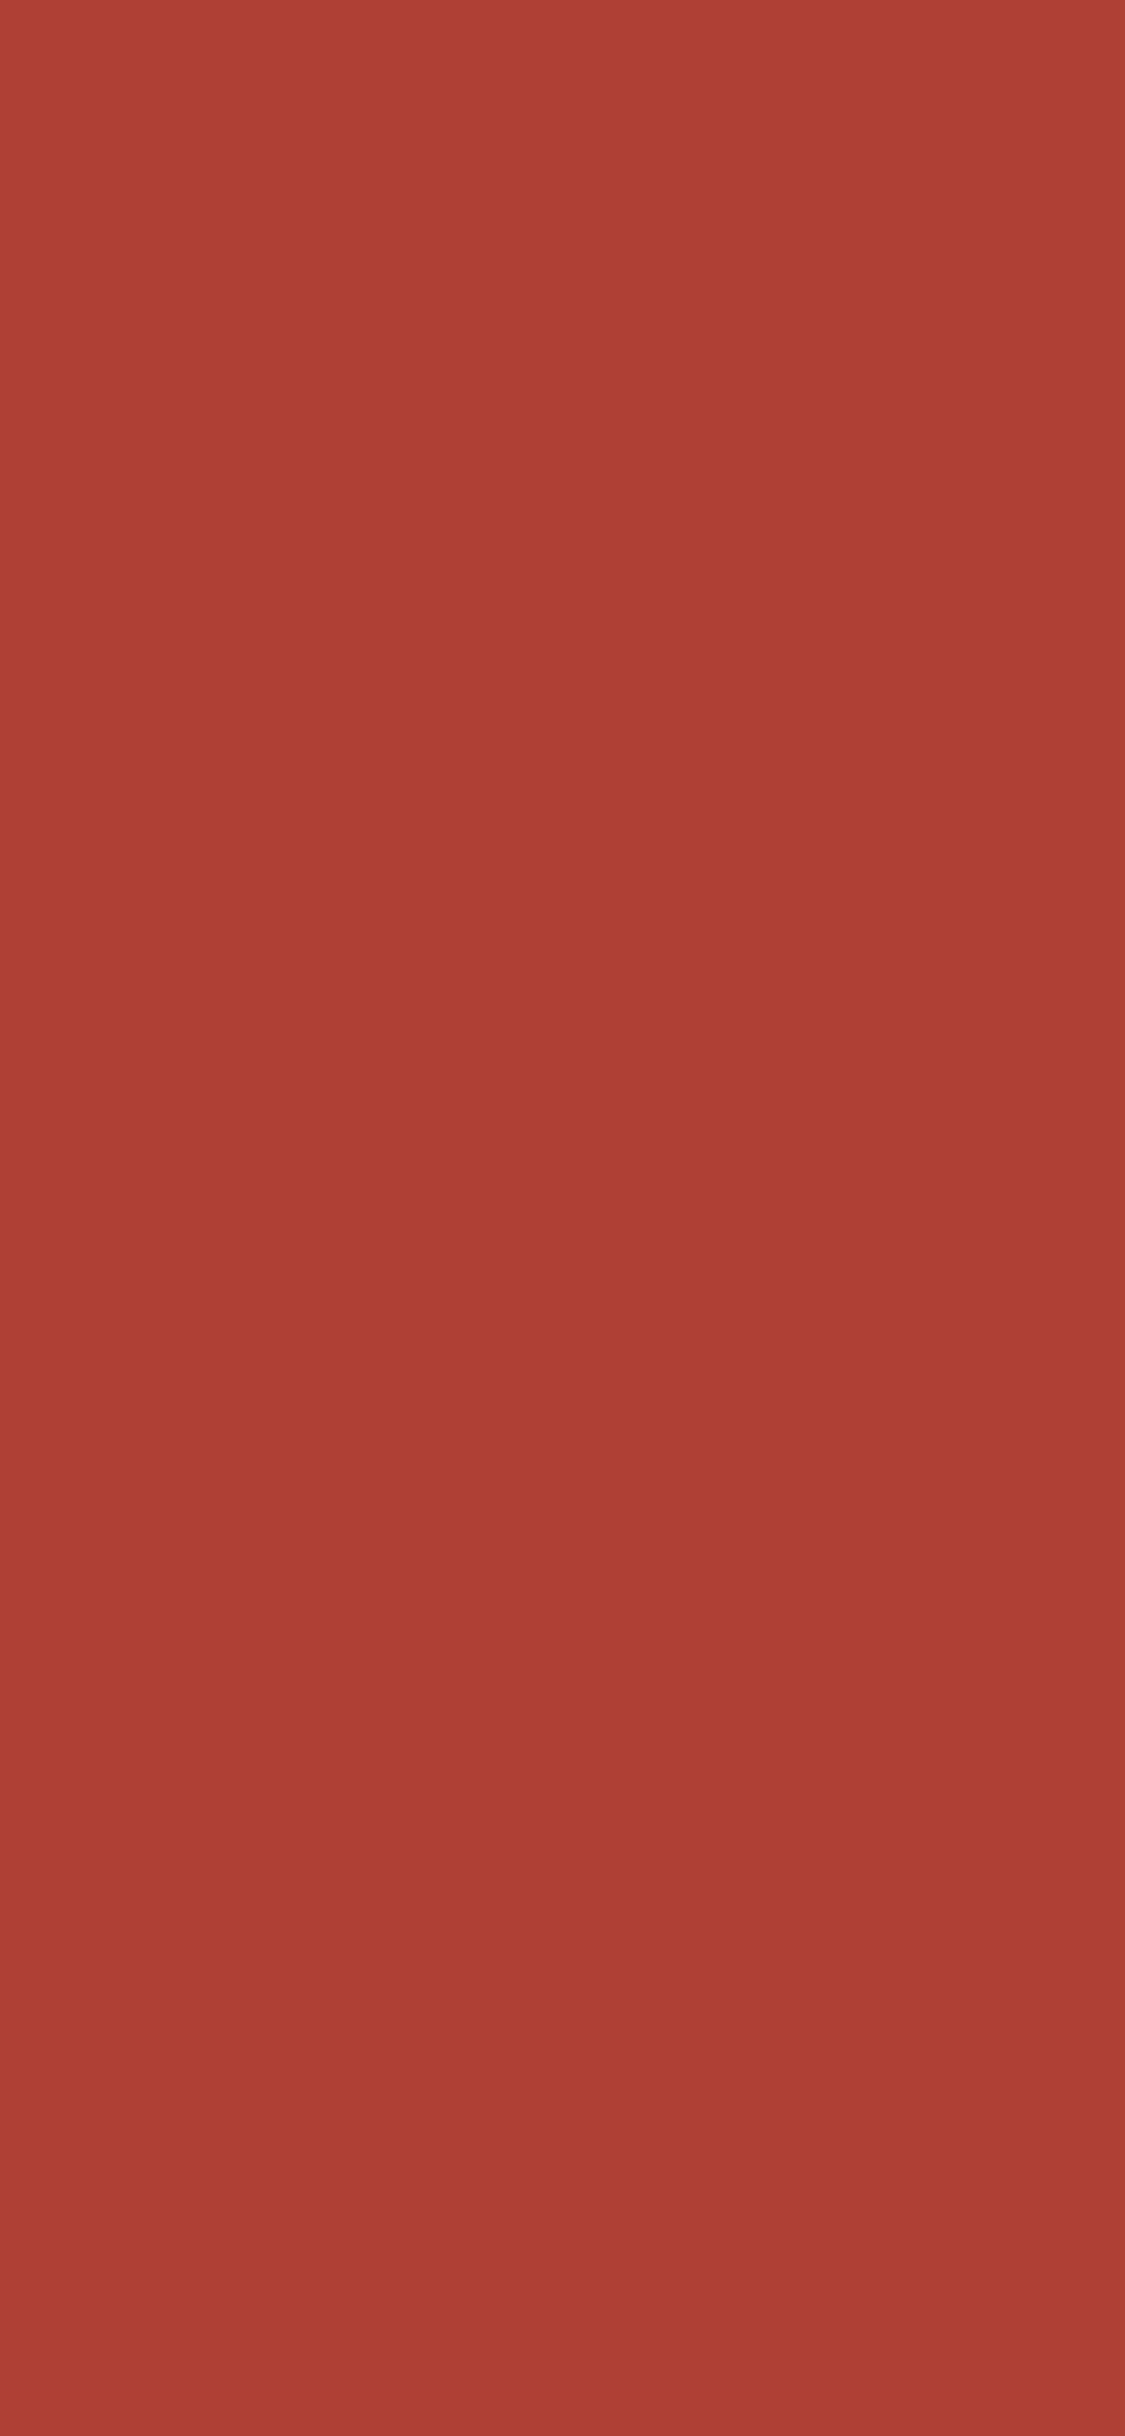 1125x2436 Pale Carmine Solid Color Background